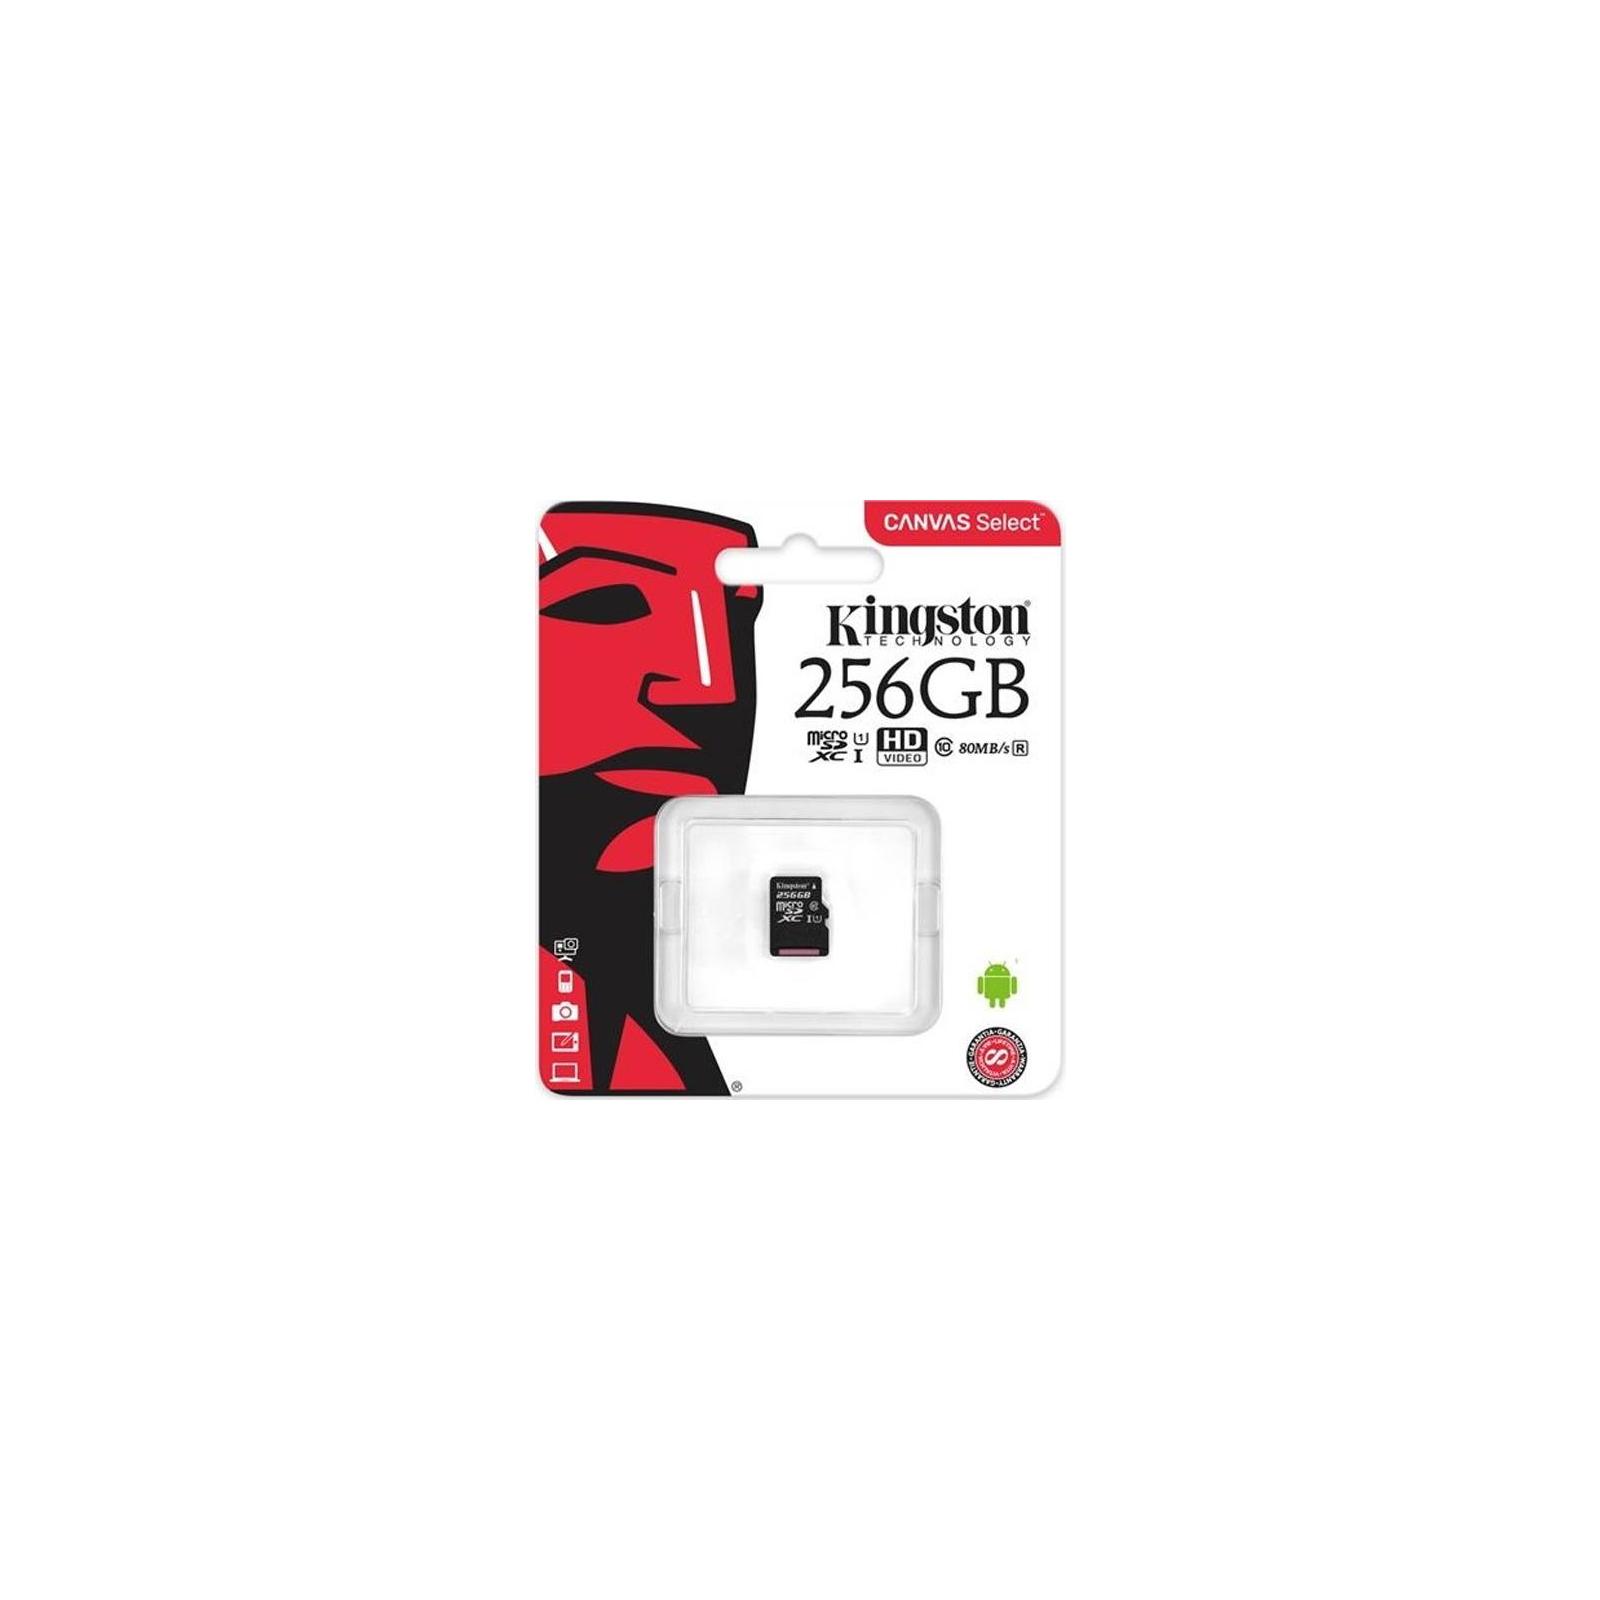 Карта памяти Kingston 256GB microSDXC class 10 UHS-I Canvas Select (SDCS/256GBSP) изображение 2